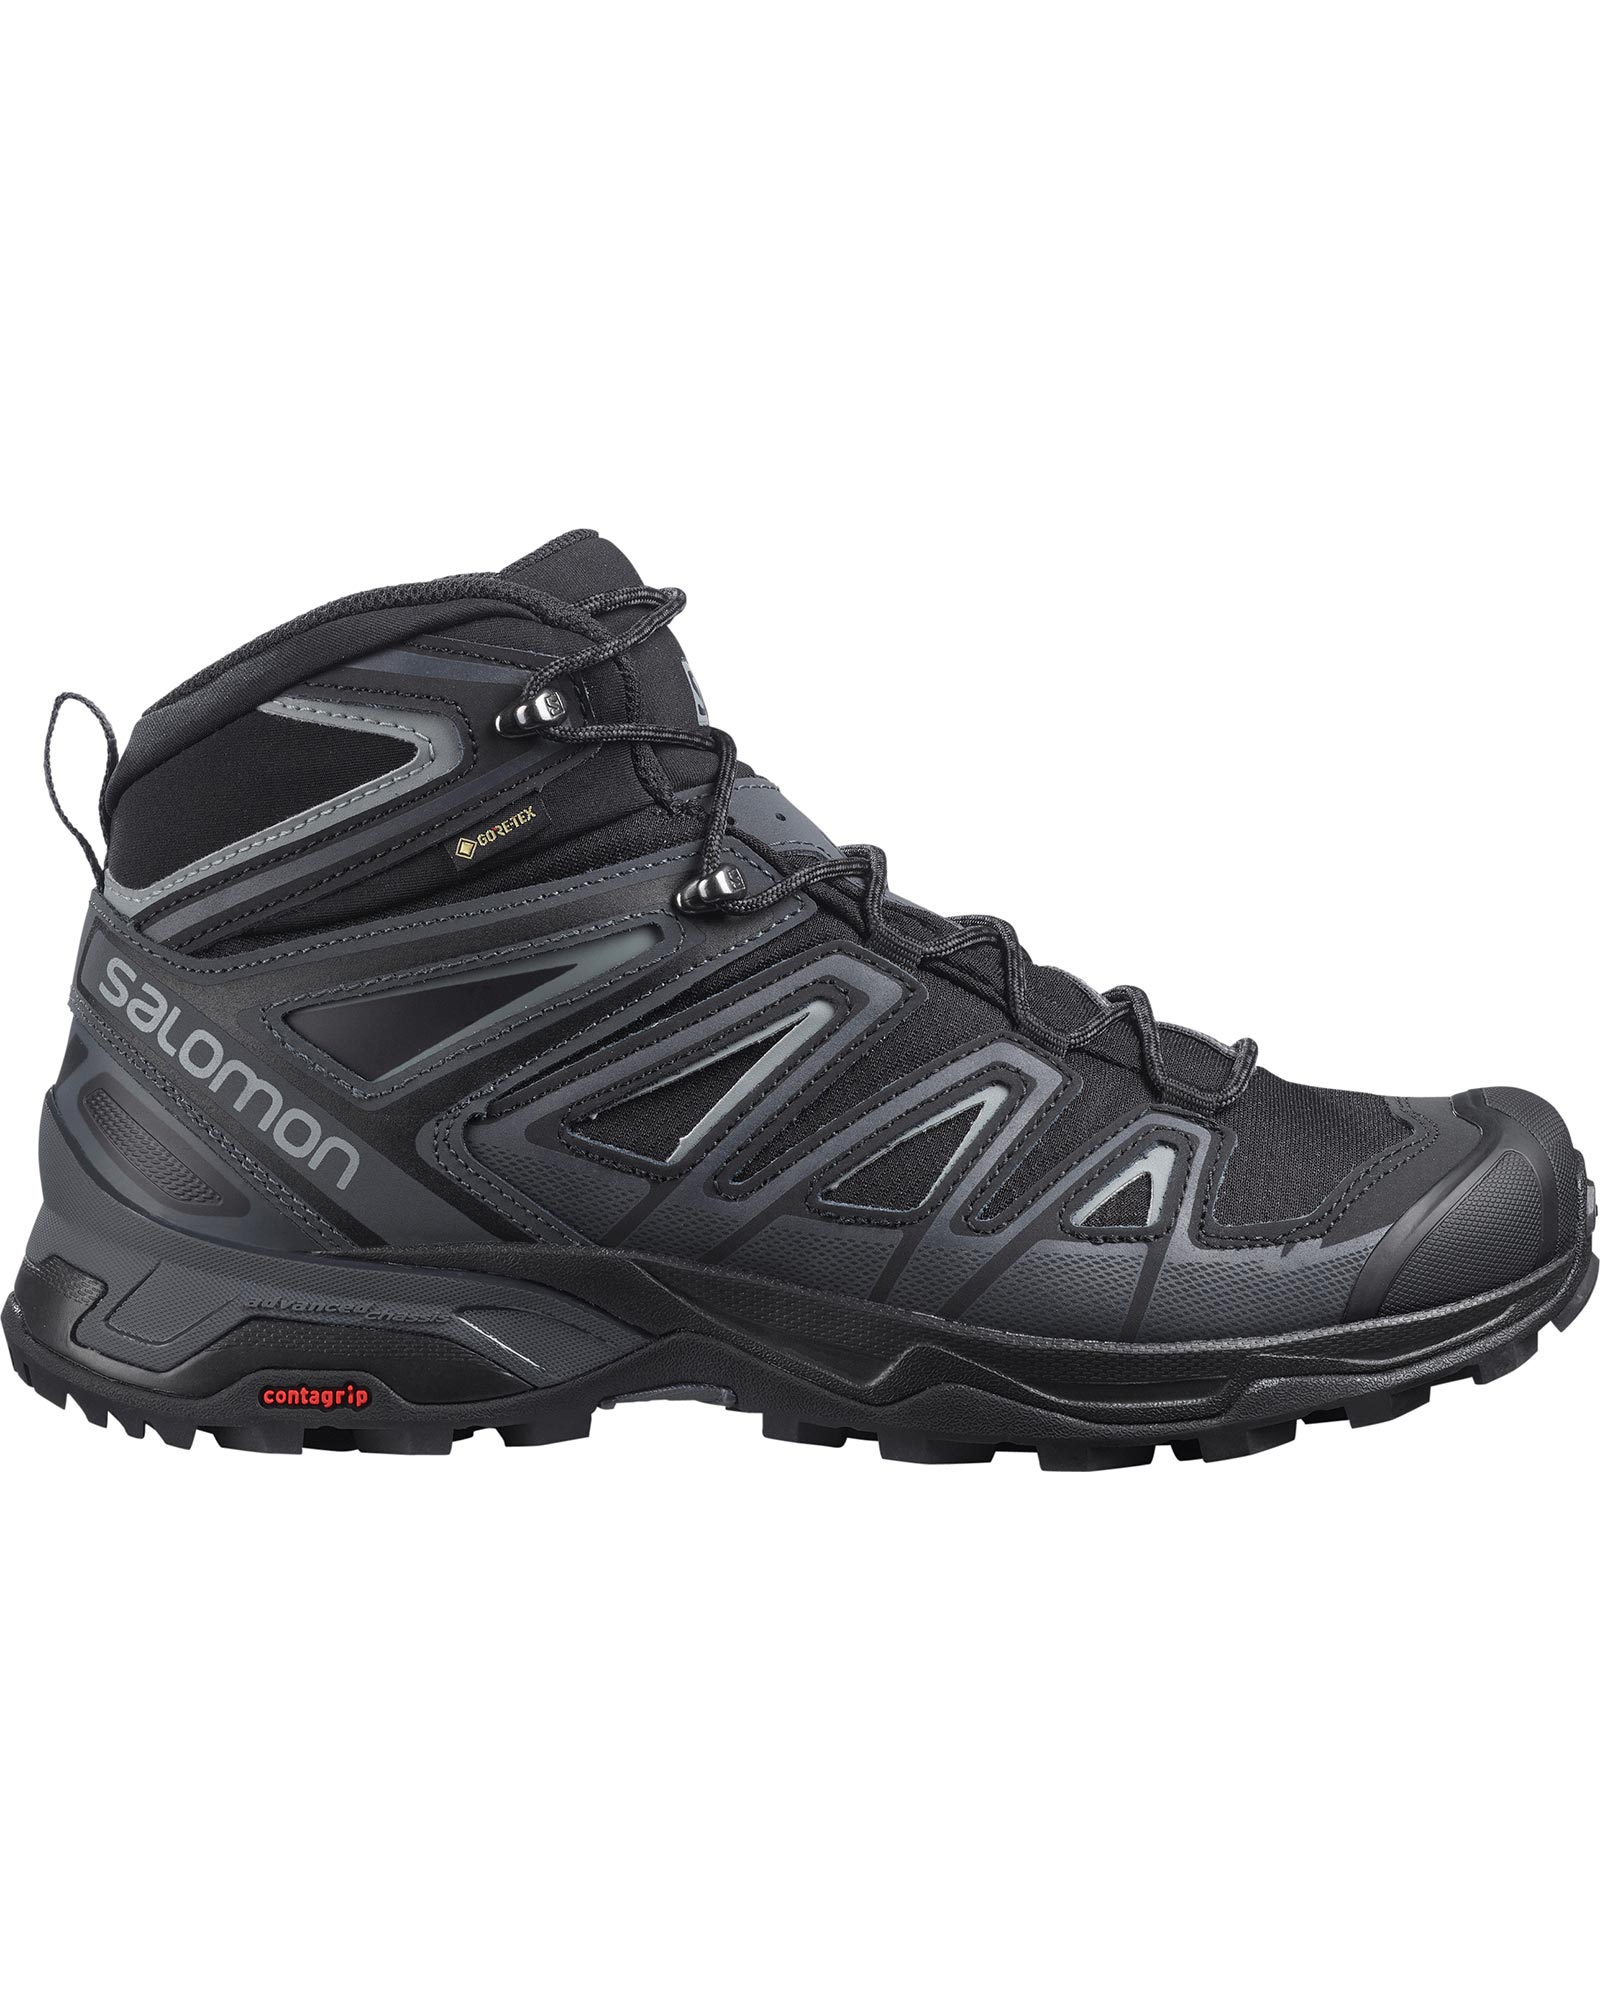 Salomon Men's X Ultra Mid 3 GORE-TEX Walking Boots 0